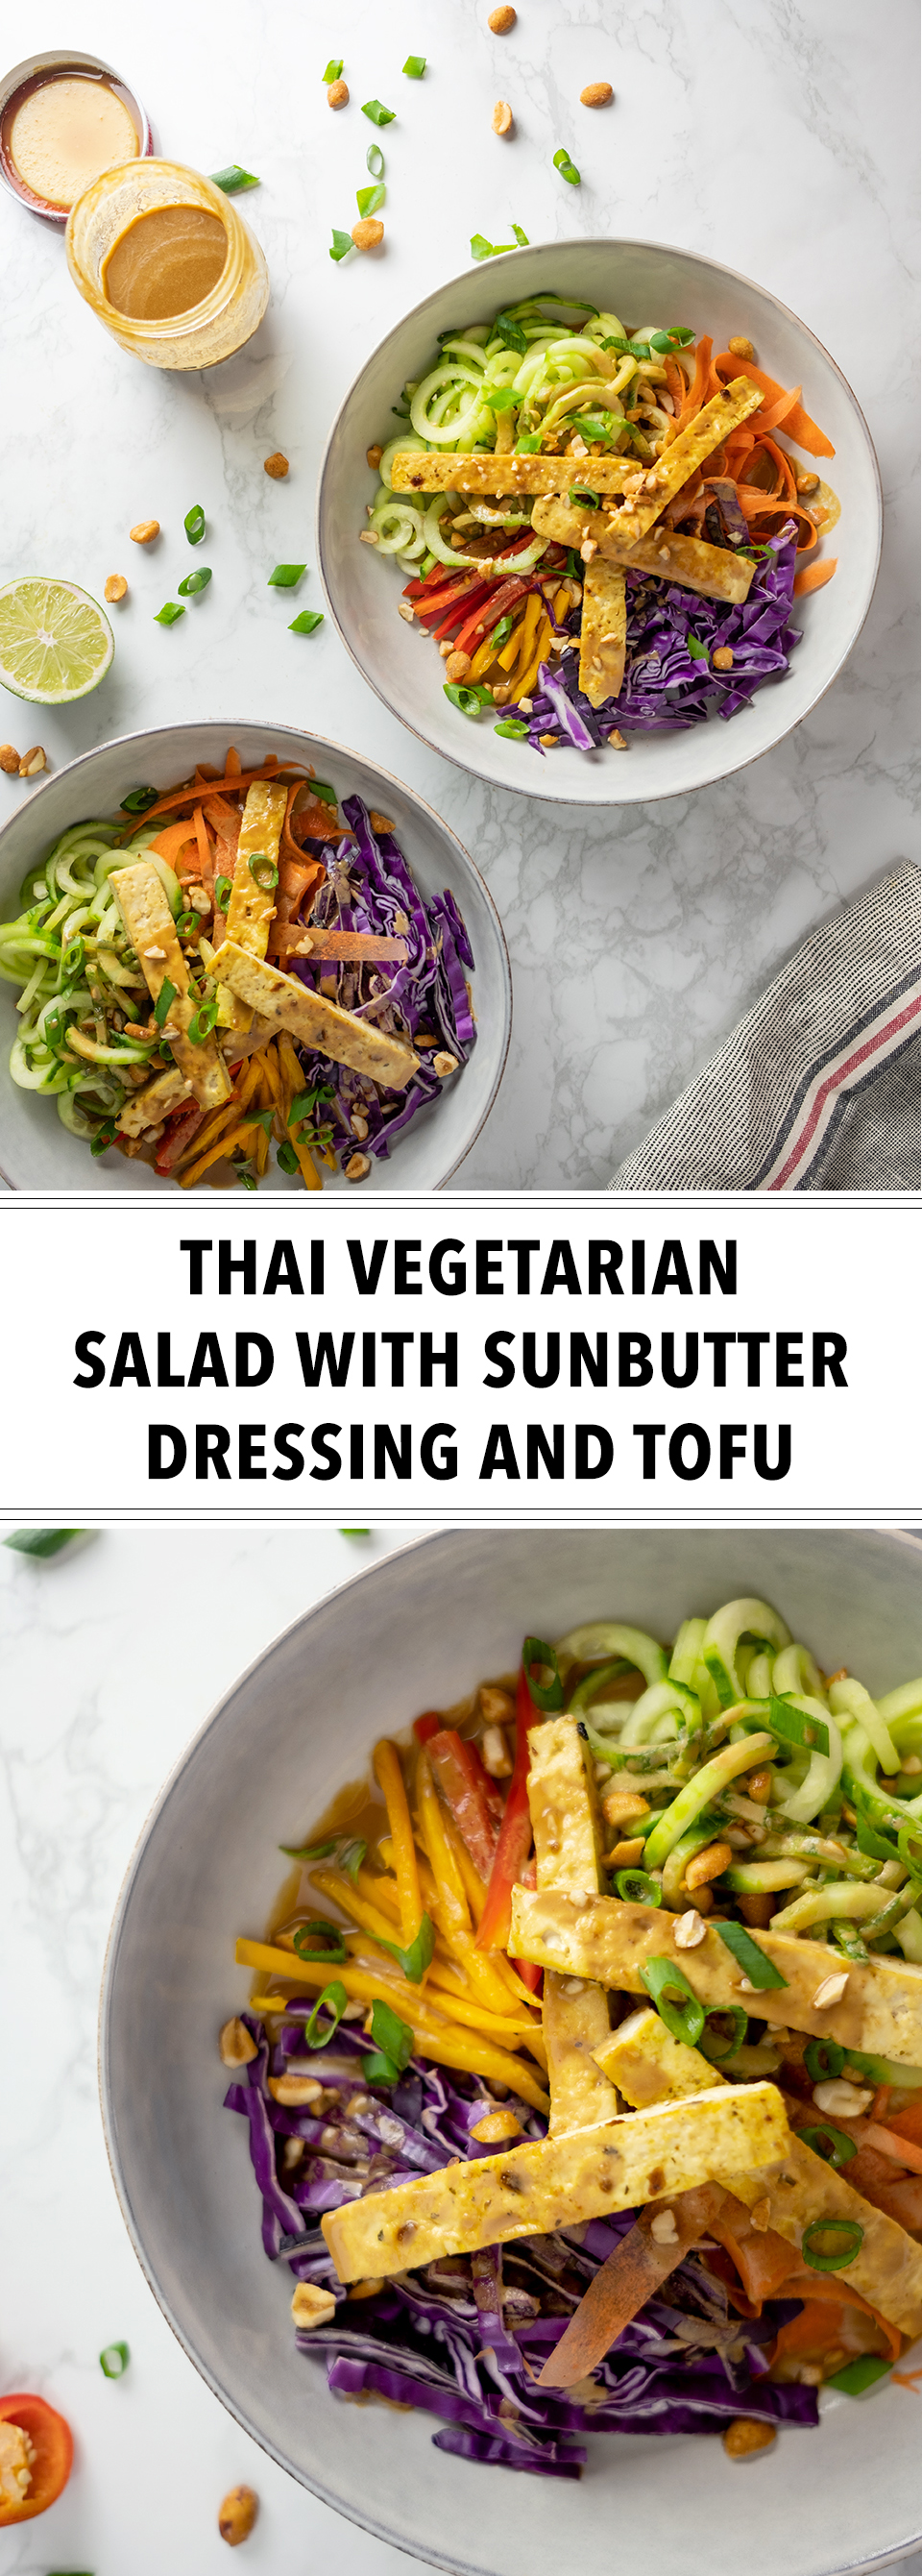 JodiLoves_Retouching_Brilliant_Pixel_Imaging_Thai-Vegetarian-Salad-with-sunbutter-tofu.jpg